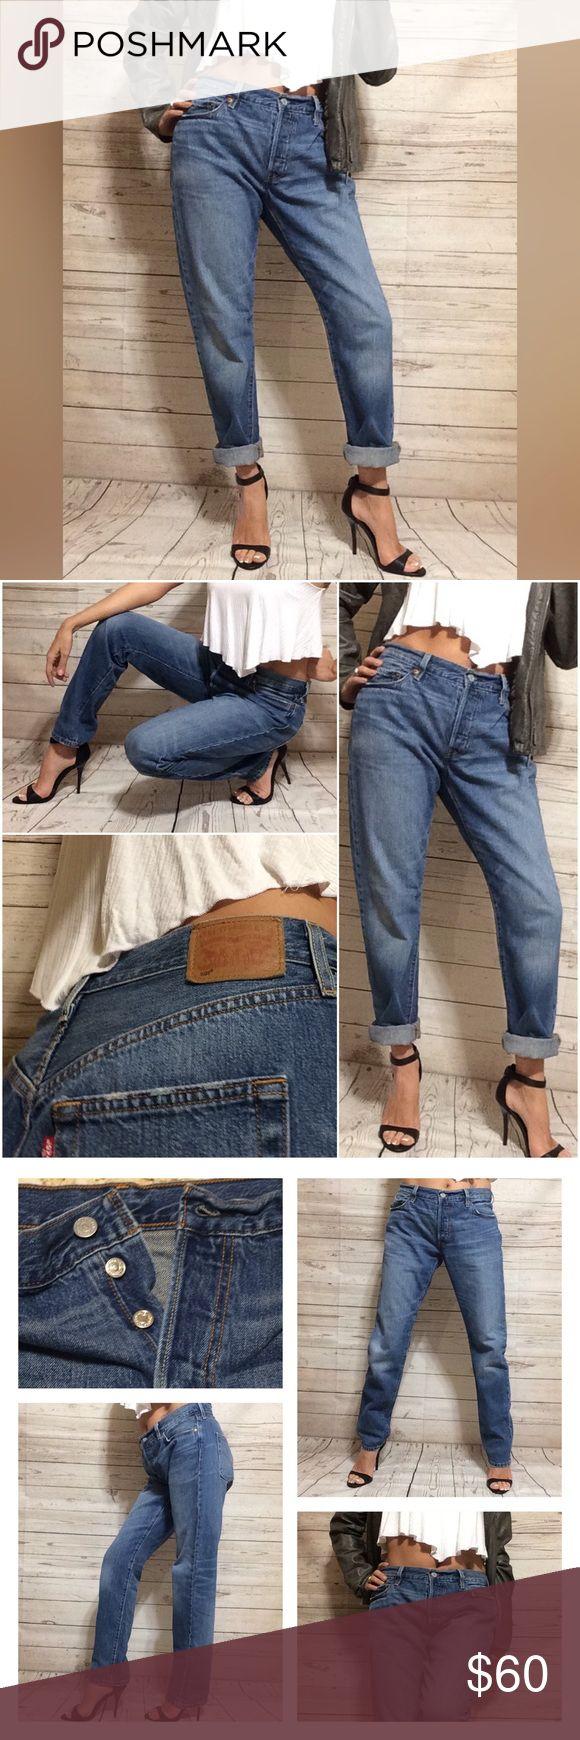 Spotted while shopping on Poshmark: ⚡️Flash Sale Vintage Levi's 501 Jeans! #poshmark #fashion #shopping #style #Levi's #Denim